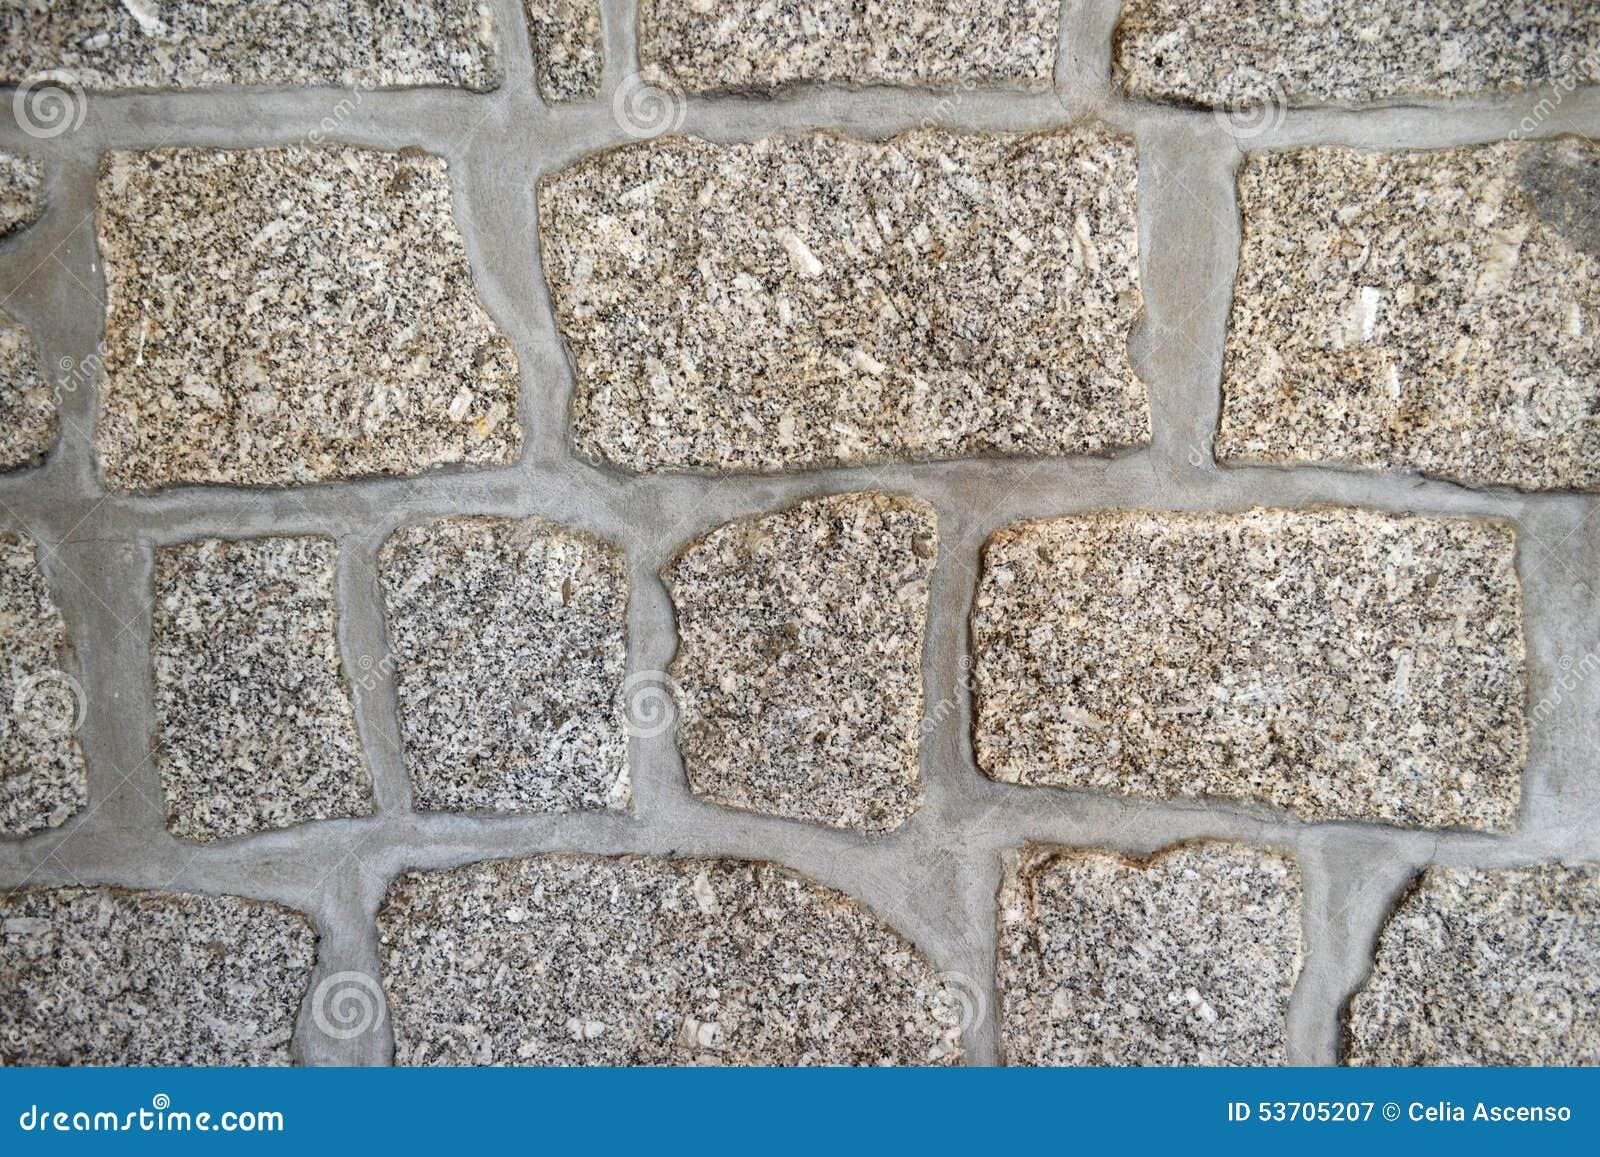 Extremely Large Stone Block : Granite blocks stone wall stock image of build